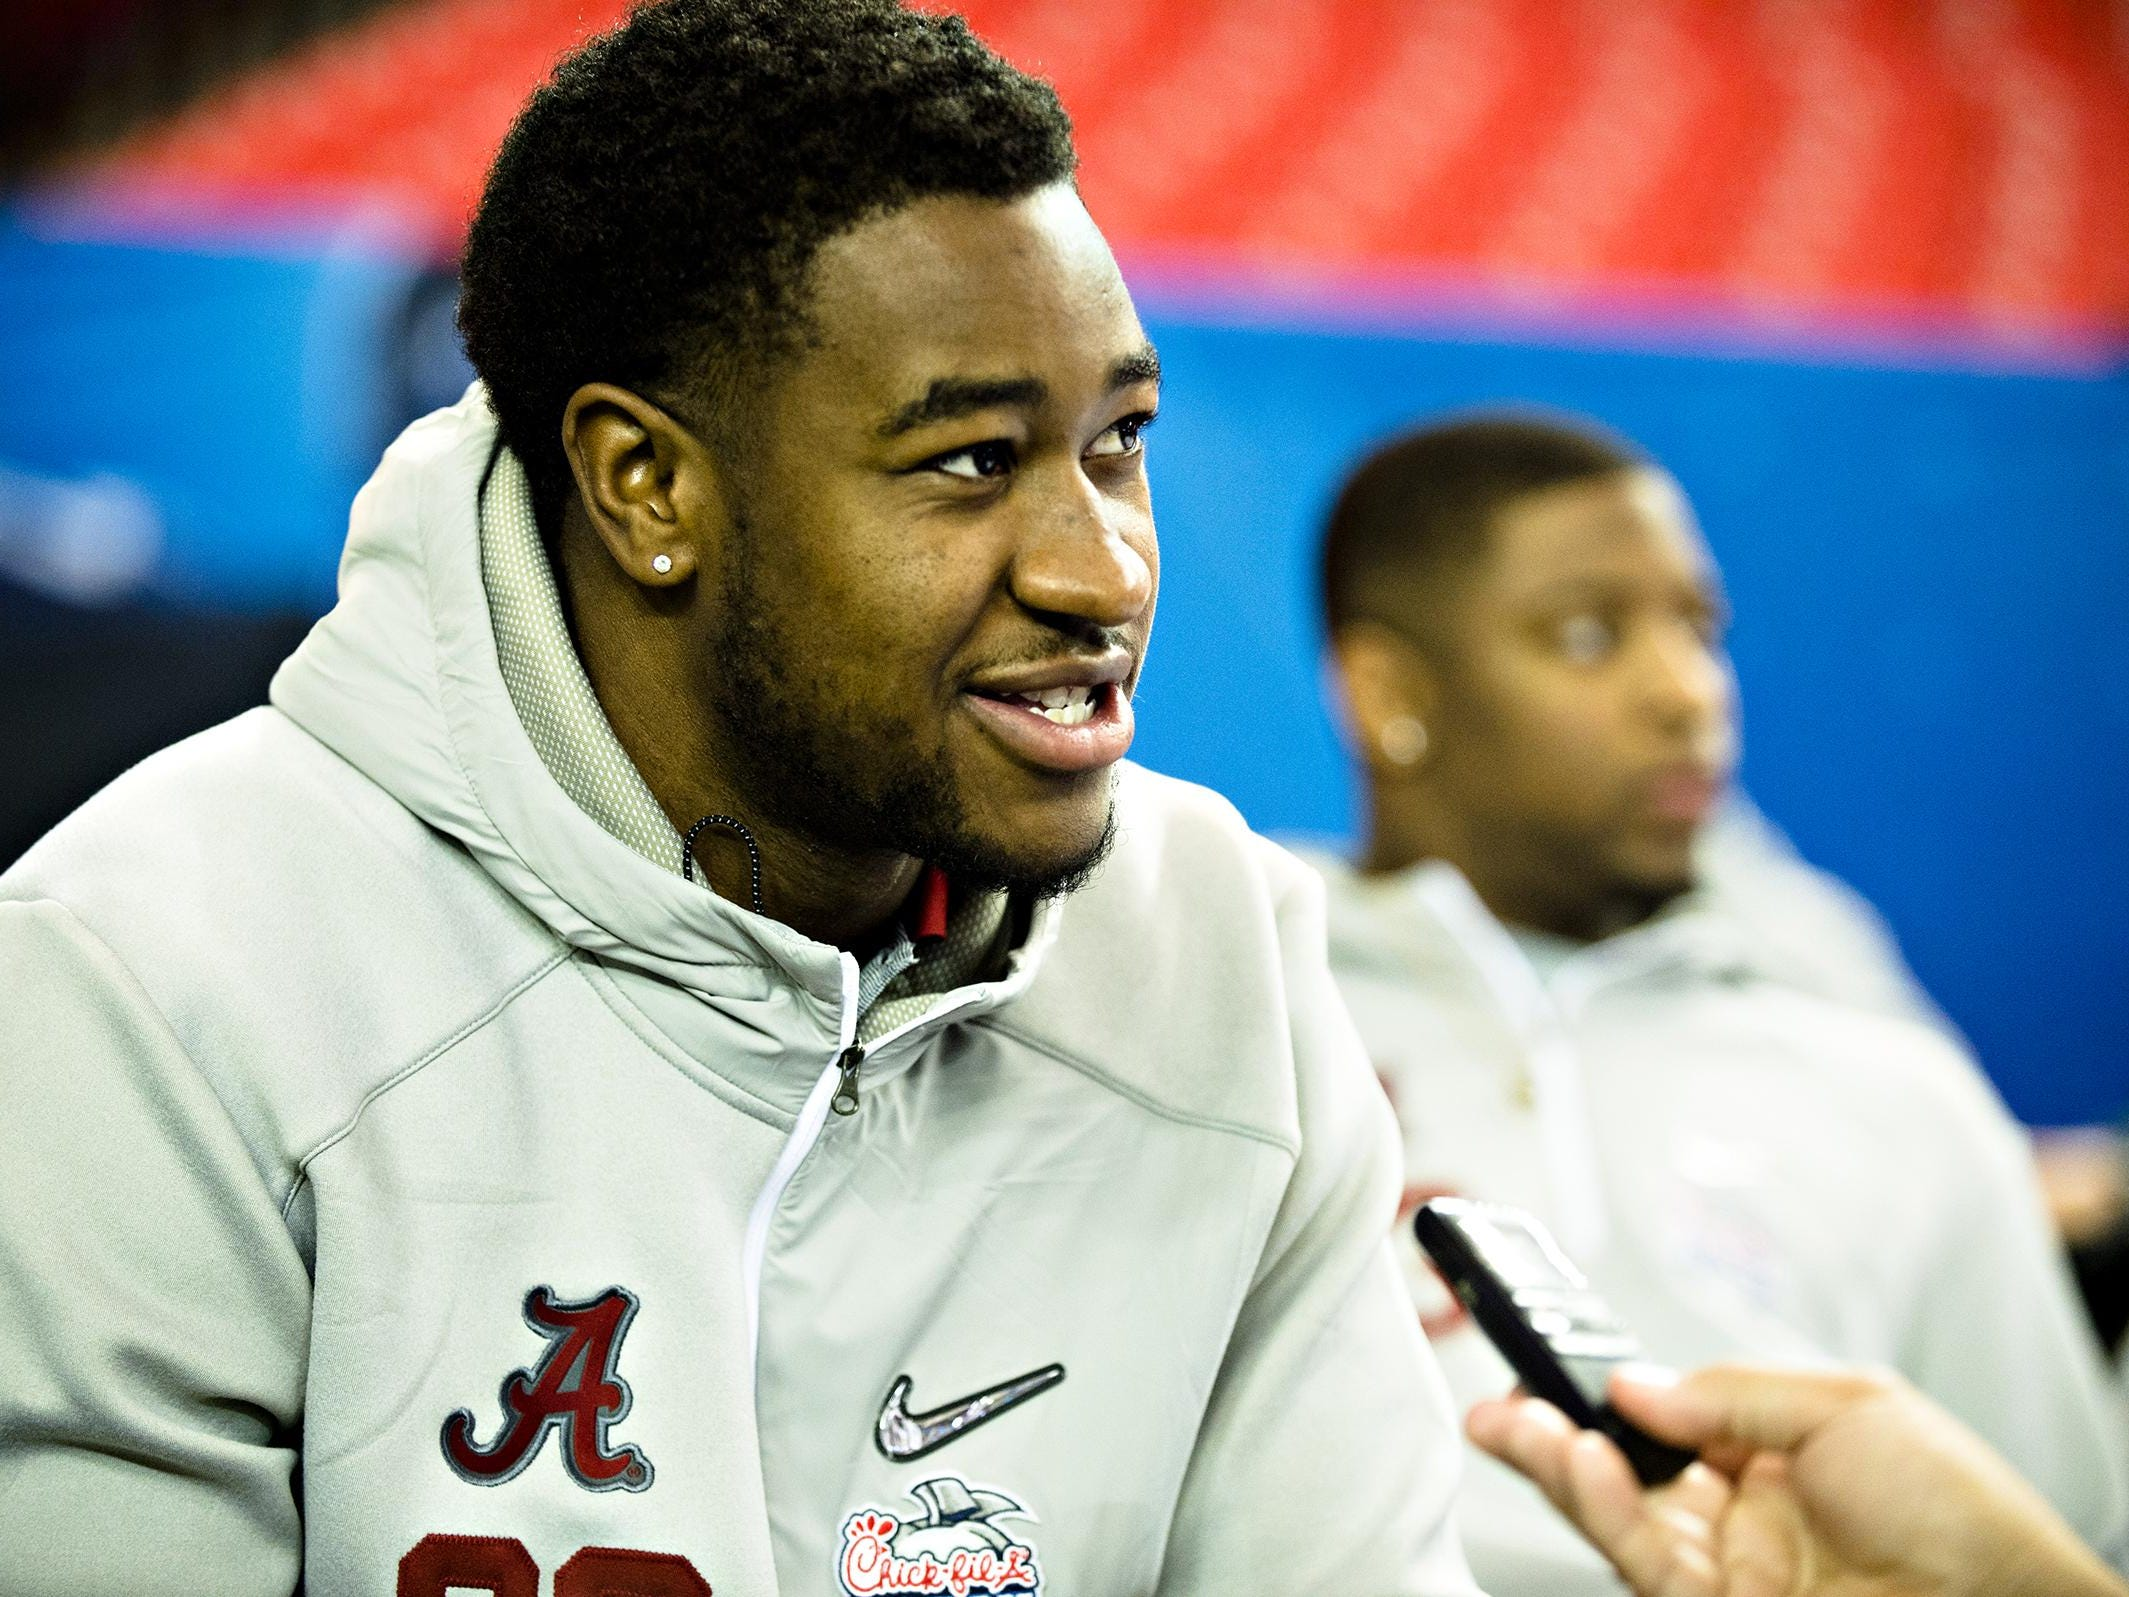 Alabama linebacker Shaun Dion Hamilton (20) speaks to the media during the Peach Bowl Media Day event at the Georgia Dome in Atlanta, Ga., on Thursday, Dec. 29, 2016.